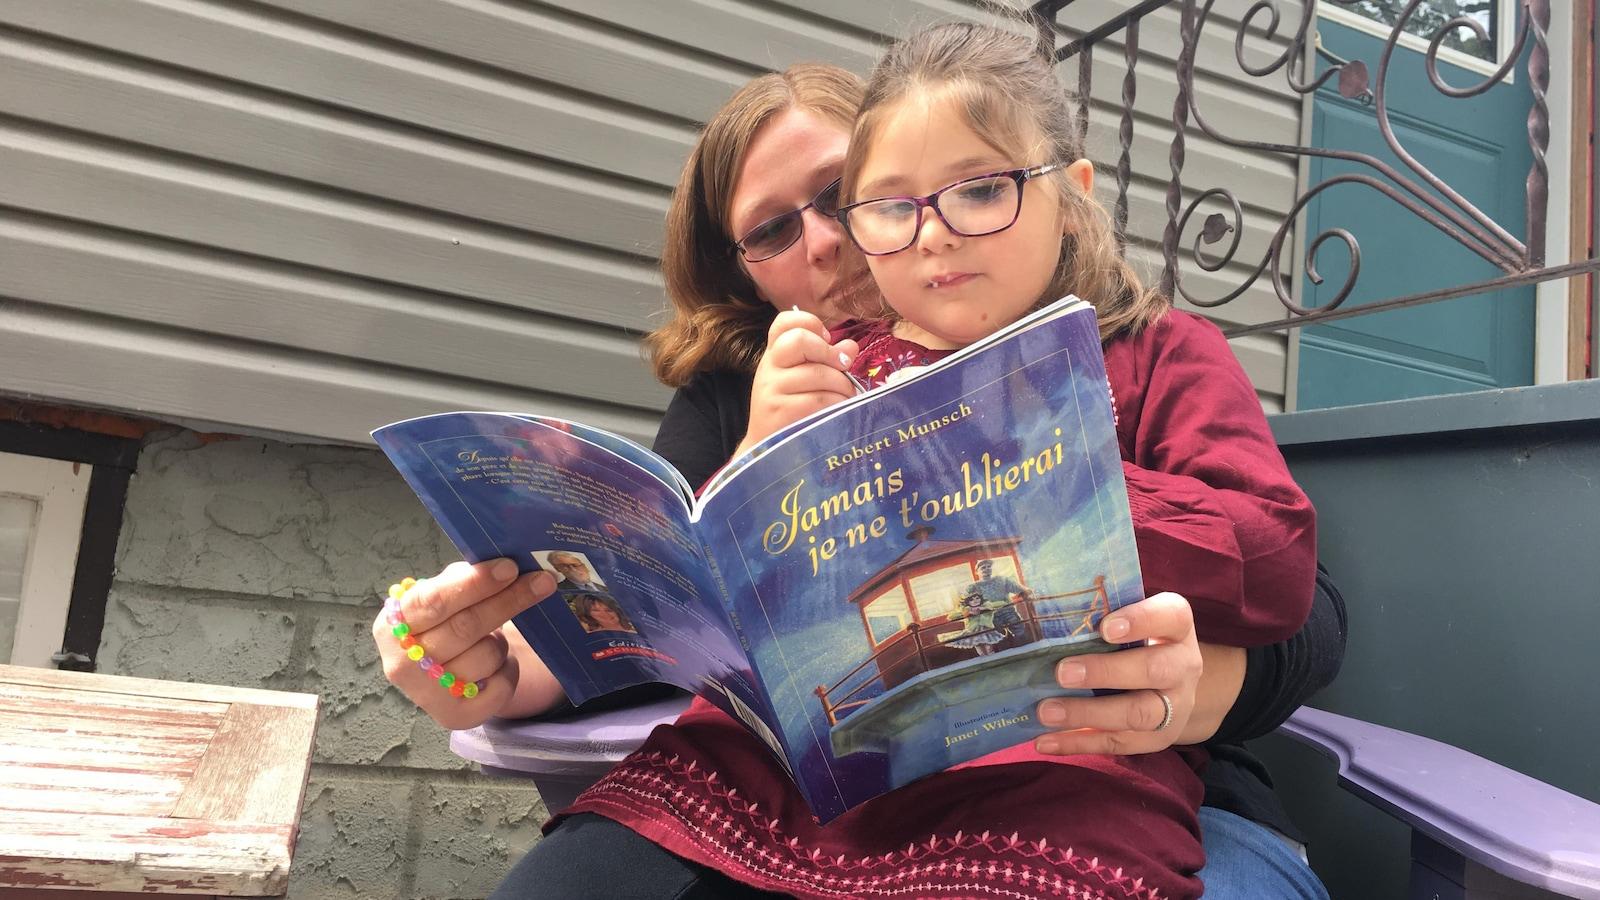 Samantha Zitaruk et sa fille Sabreen Iraqi lisent ensemble un livre en français.